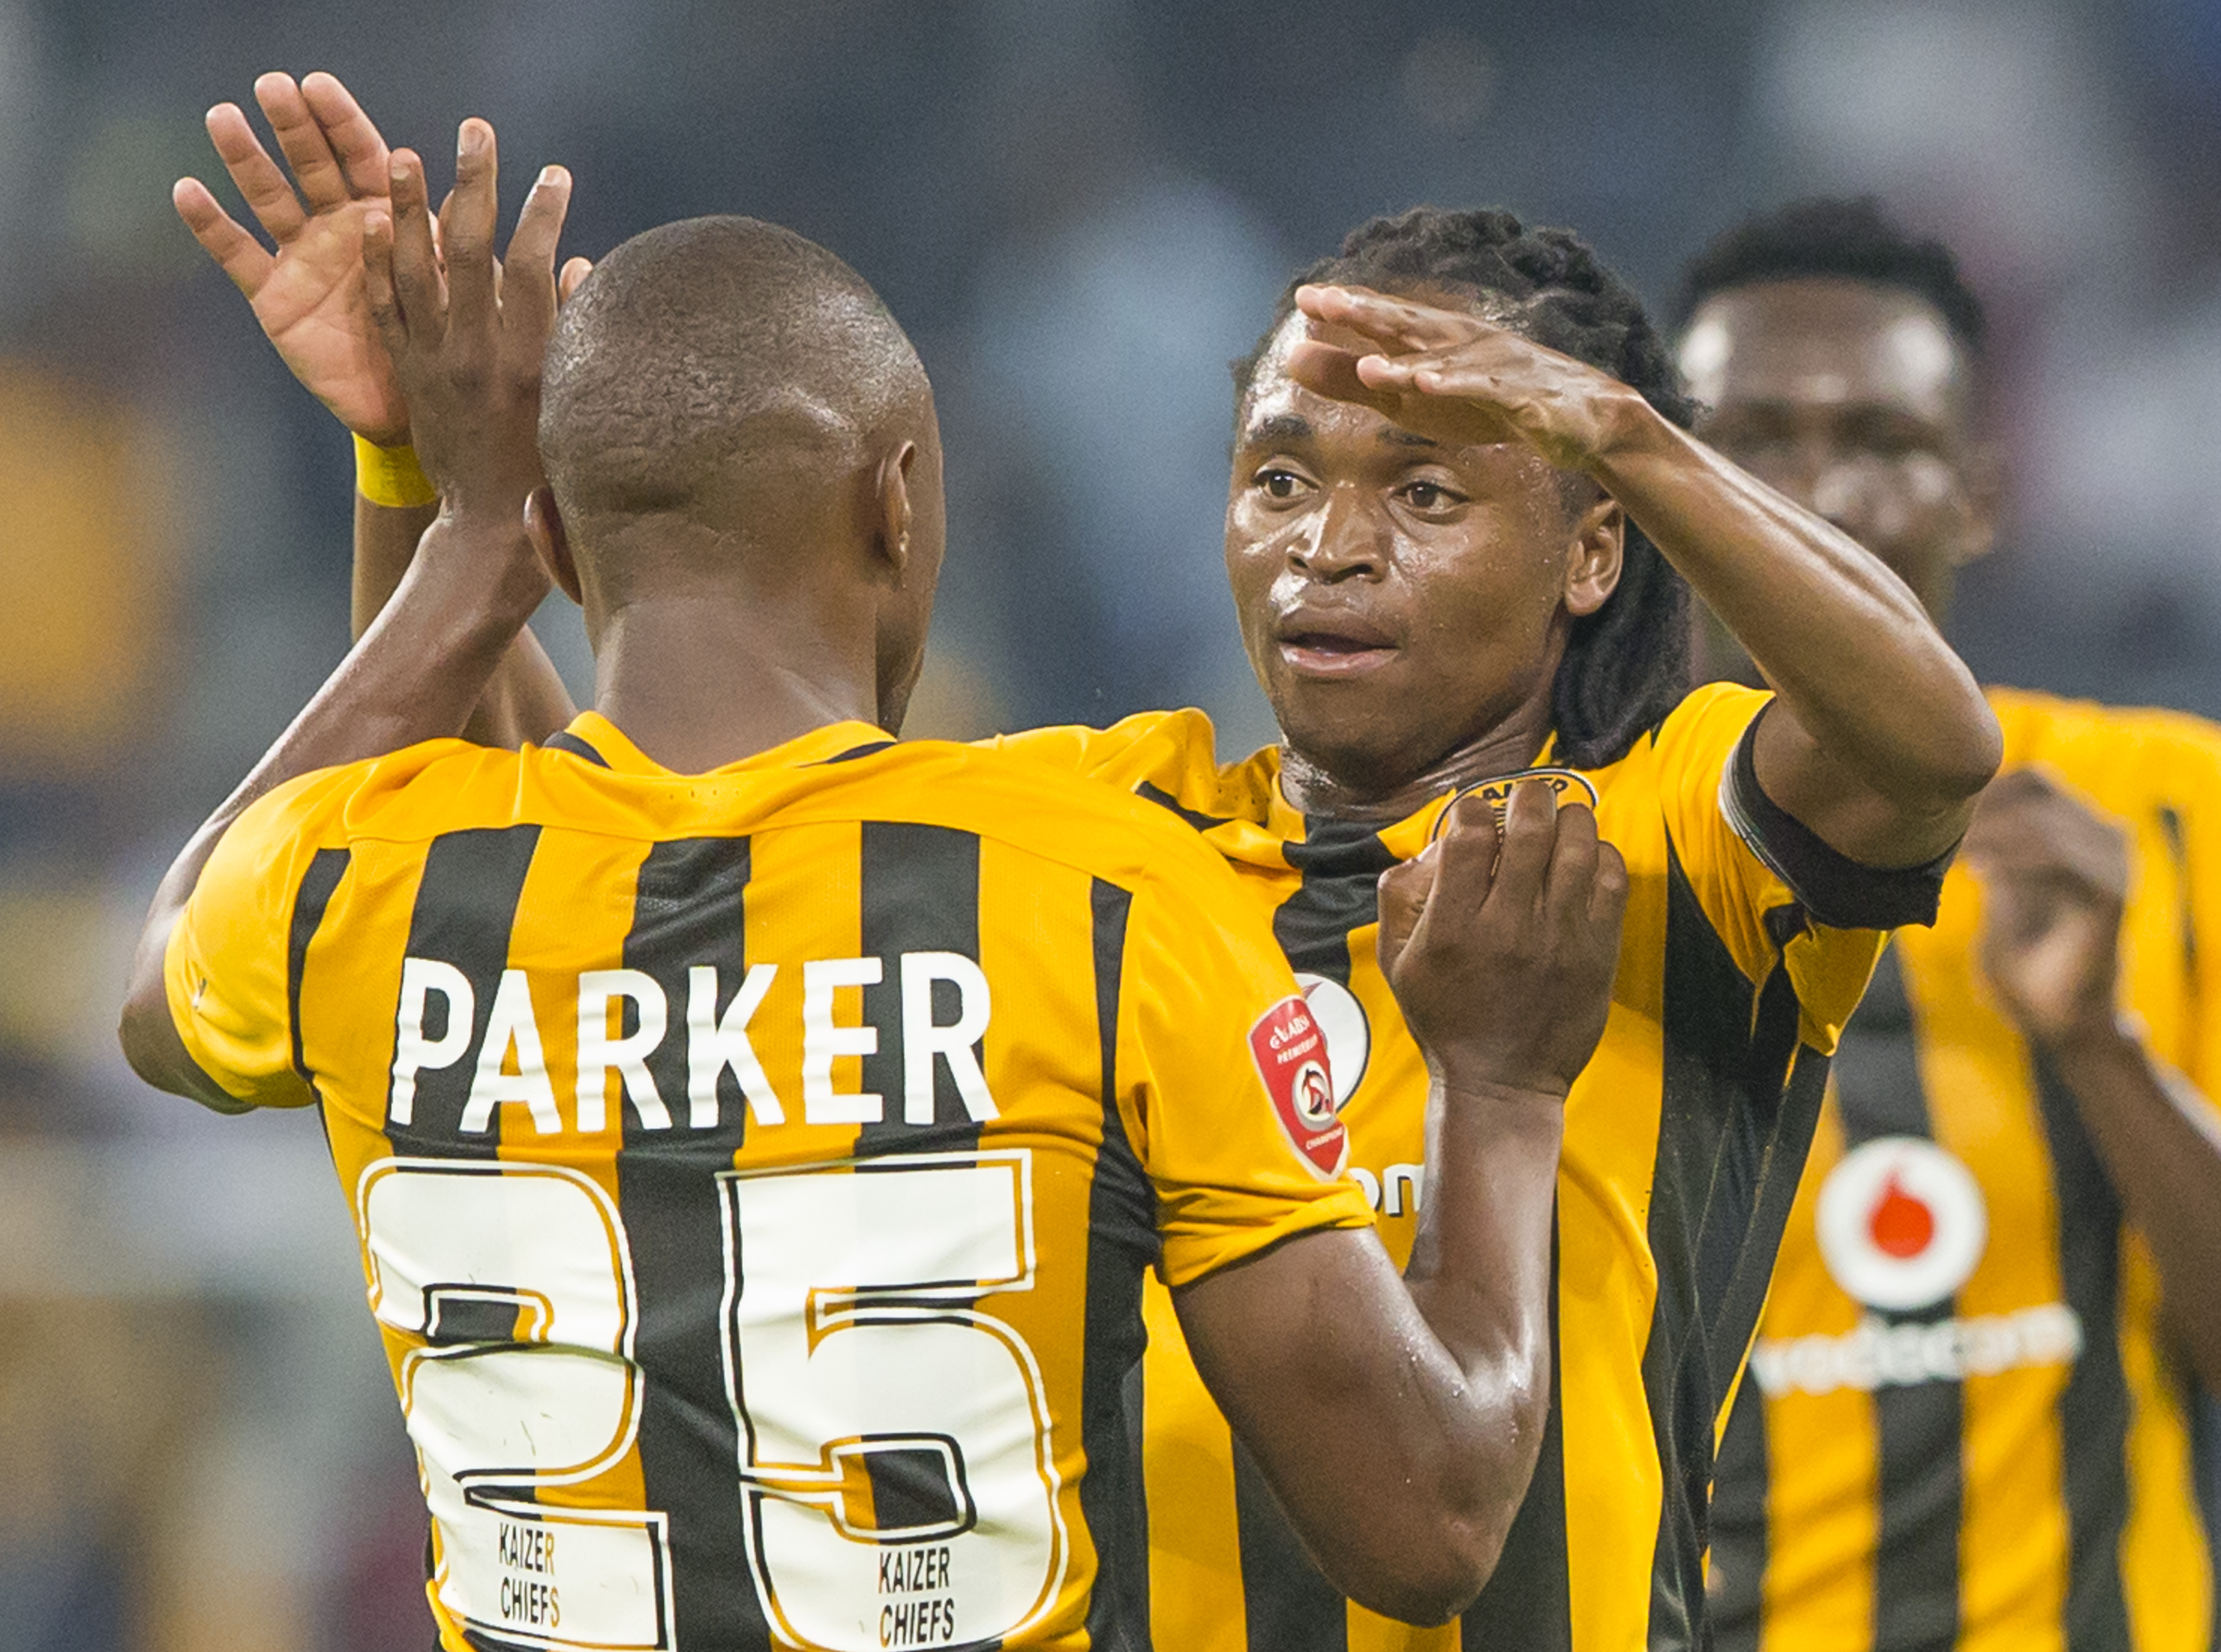 Bernard Parker and Siphiwe Tshabalala - Kaizer Chiefs